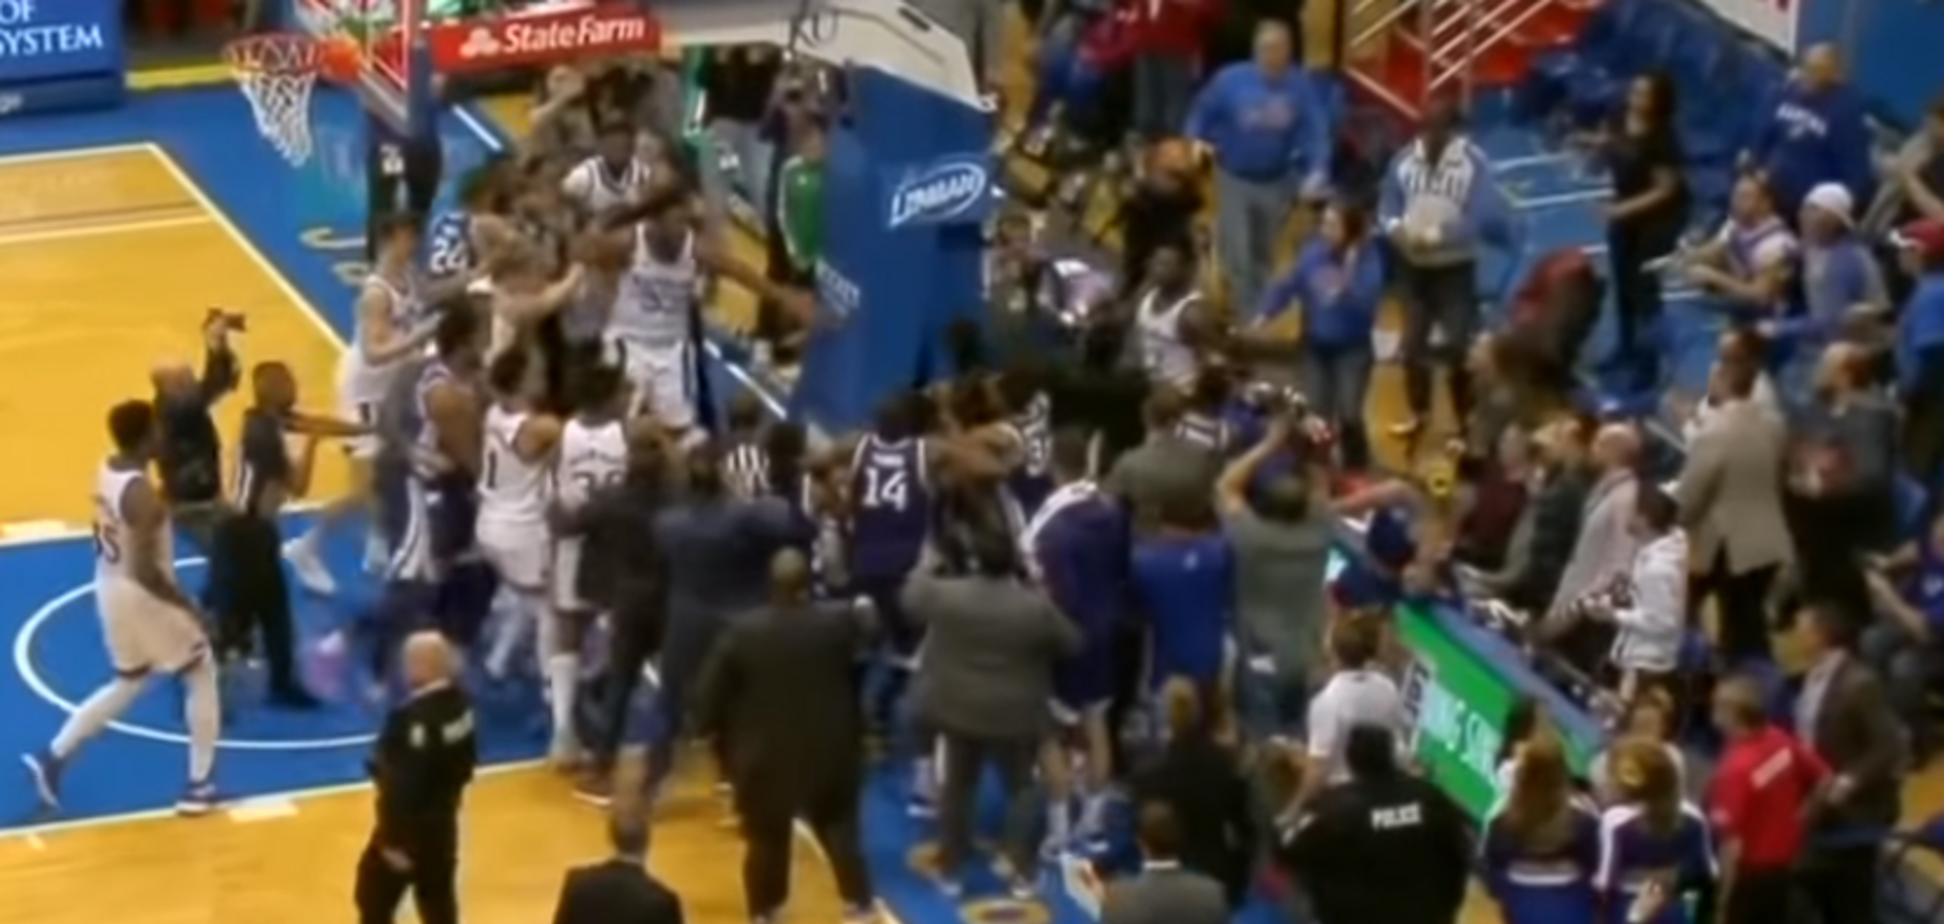 Массовая драка на матче NCAA между Канзасом и Канзас Стэйт